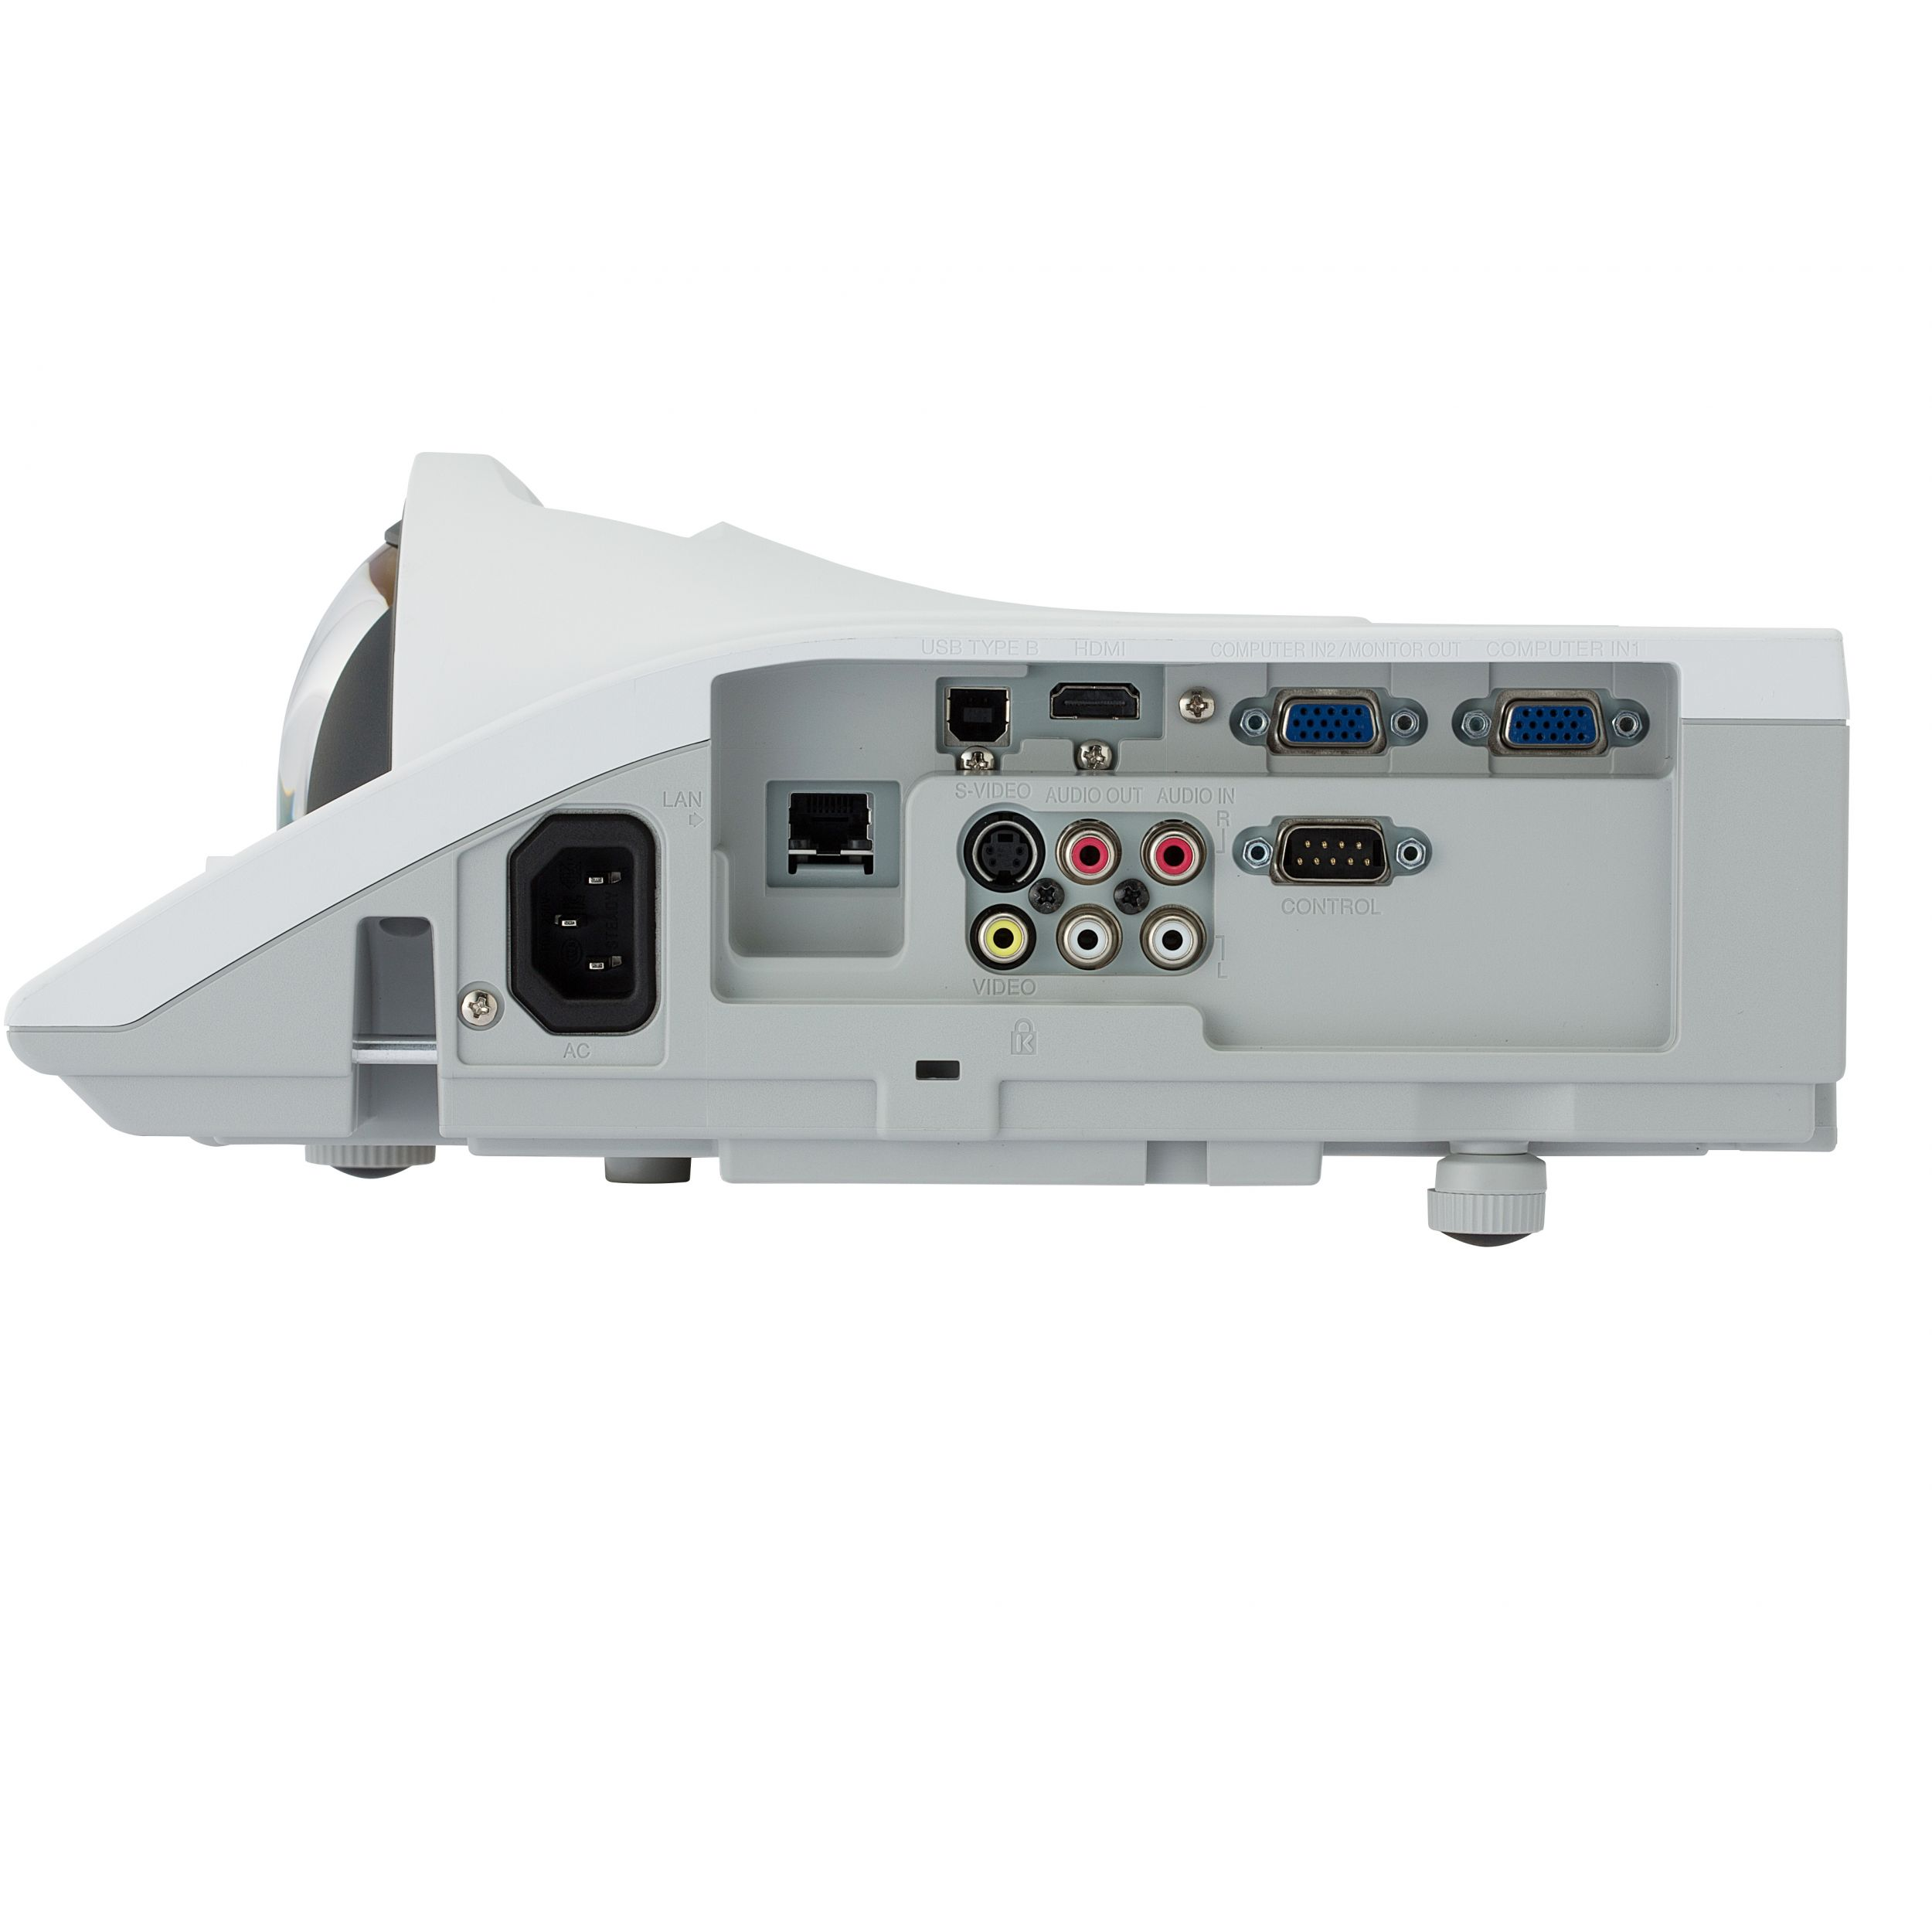 Hitachi cpx5022wn